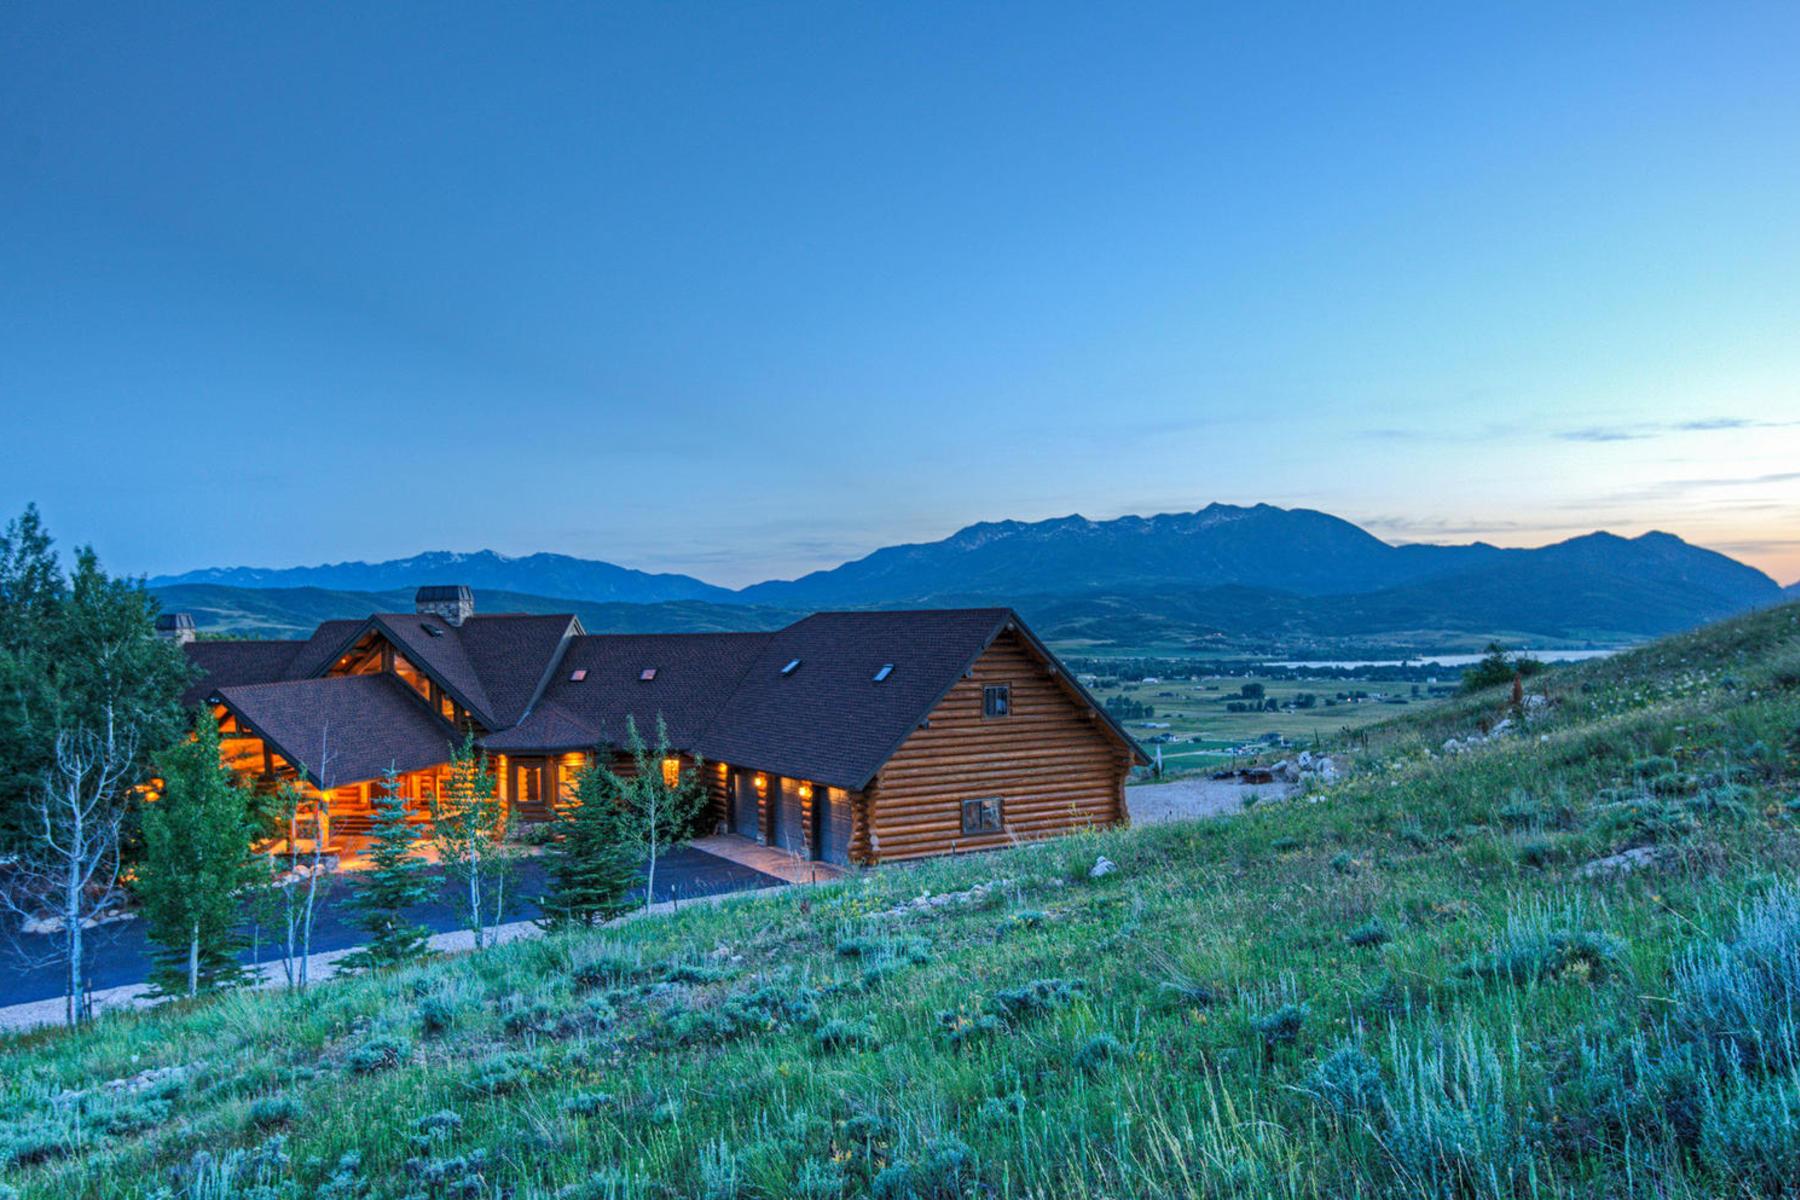 独户住宅 为 销售 在 Breathtaking views from luxury Neville log home 9542 Kelley Dr 亨茨维尔, 犹他州 84317 美国